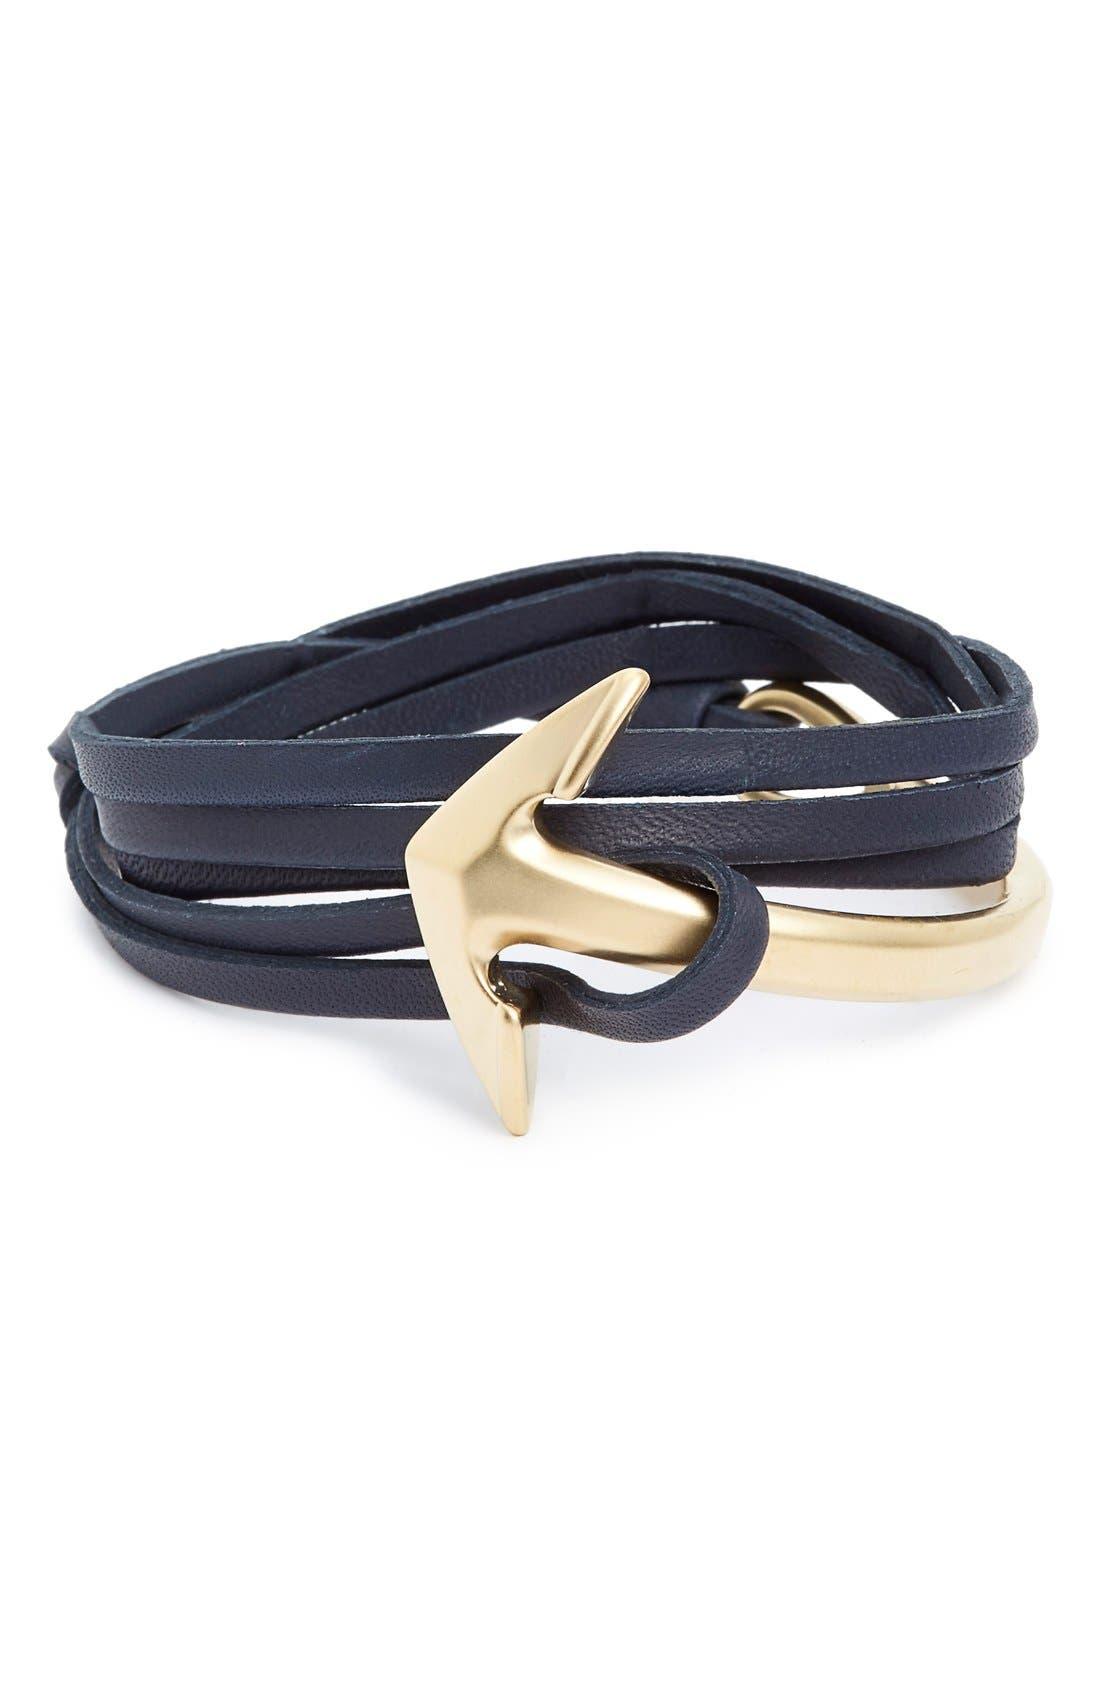 Alternate Image 1 Selected - Miansai Half Cuff Anchor Leather Wrap Bracelet